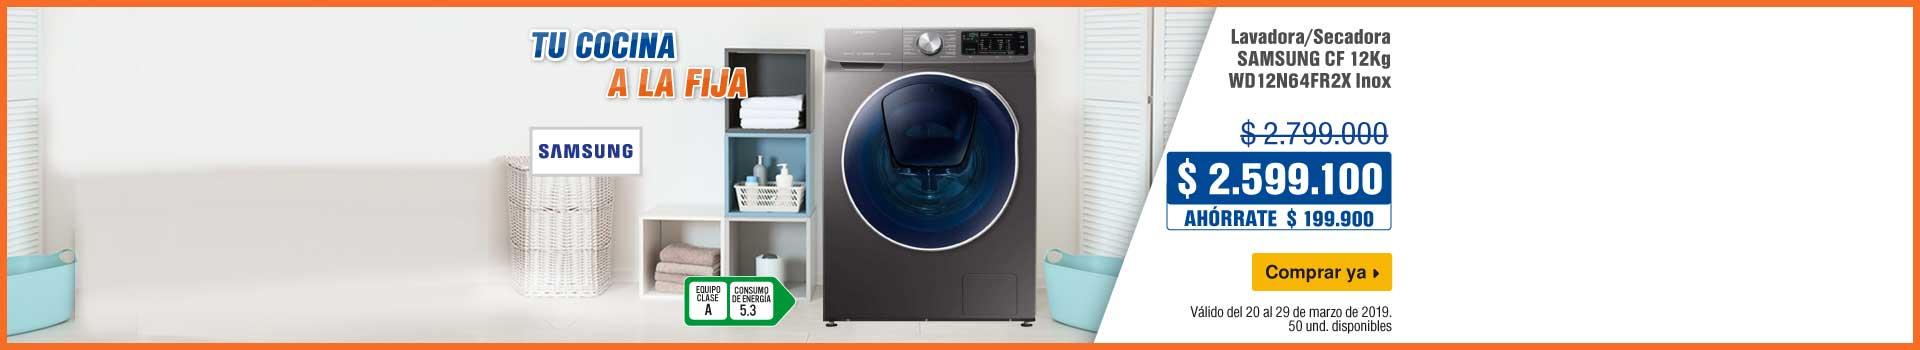 AK-KT-mayores-1-ELECT-BCAT-lavadoras-samsung-200319